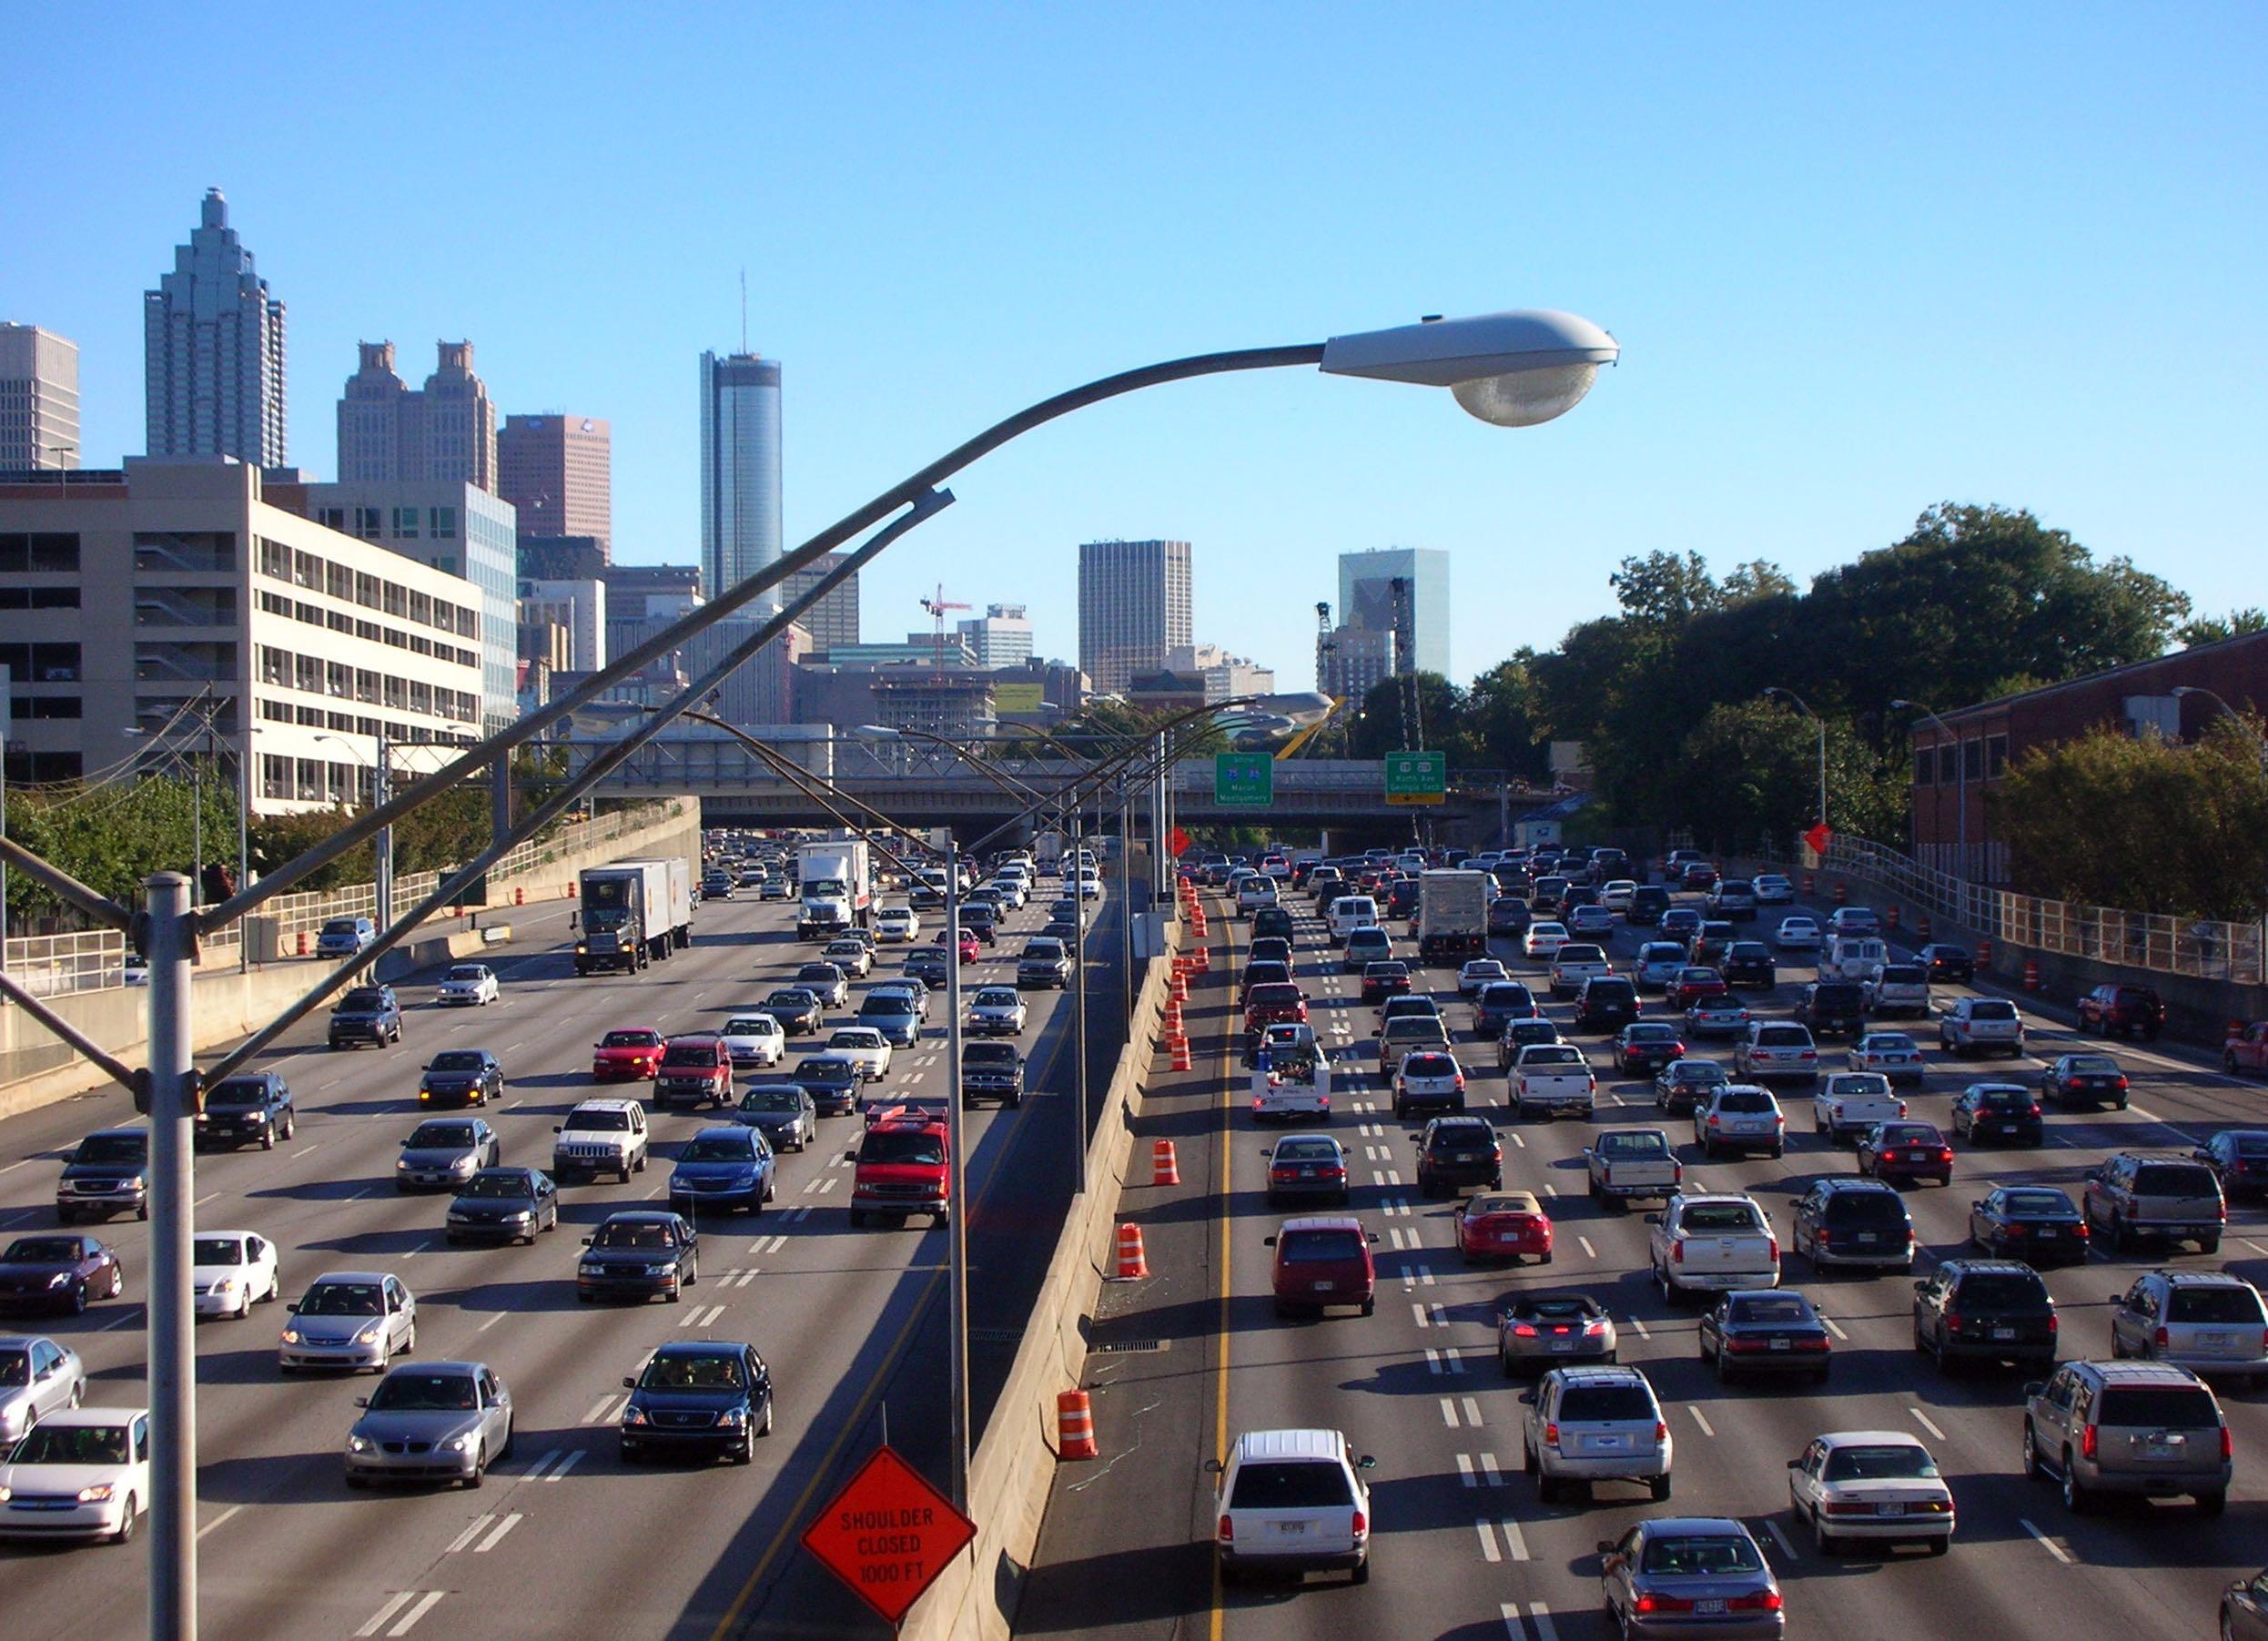 Freeway traffic in Atlanta, GA. Source: Wikimedia Commons.